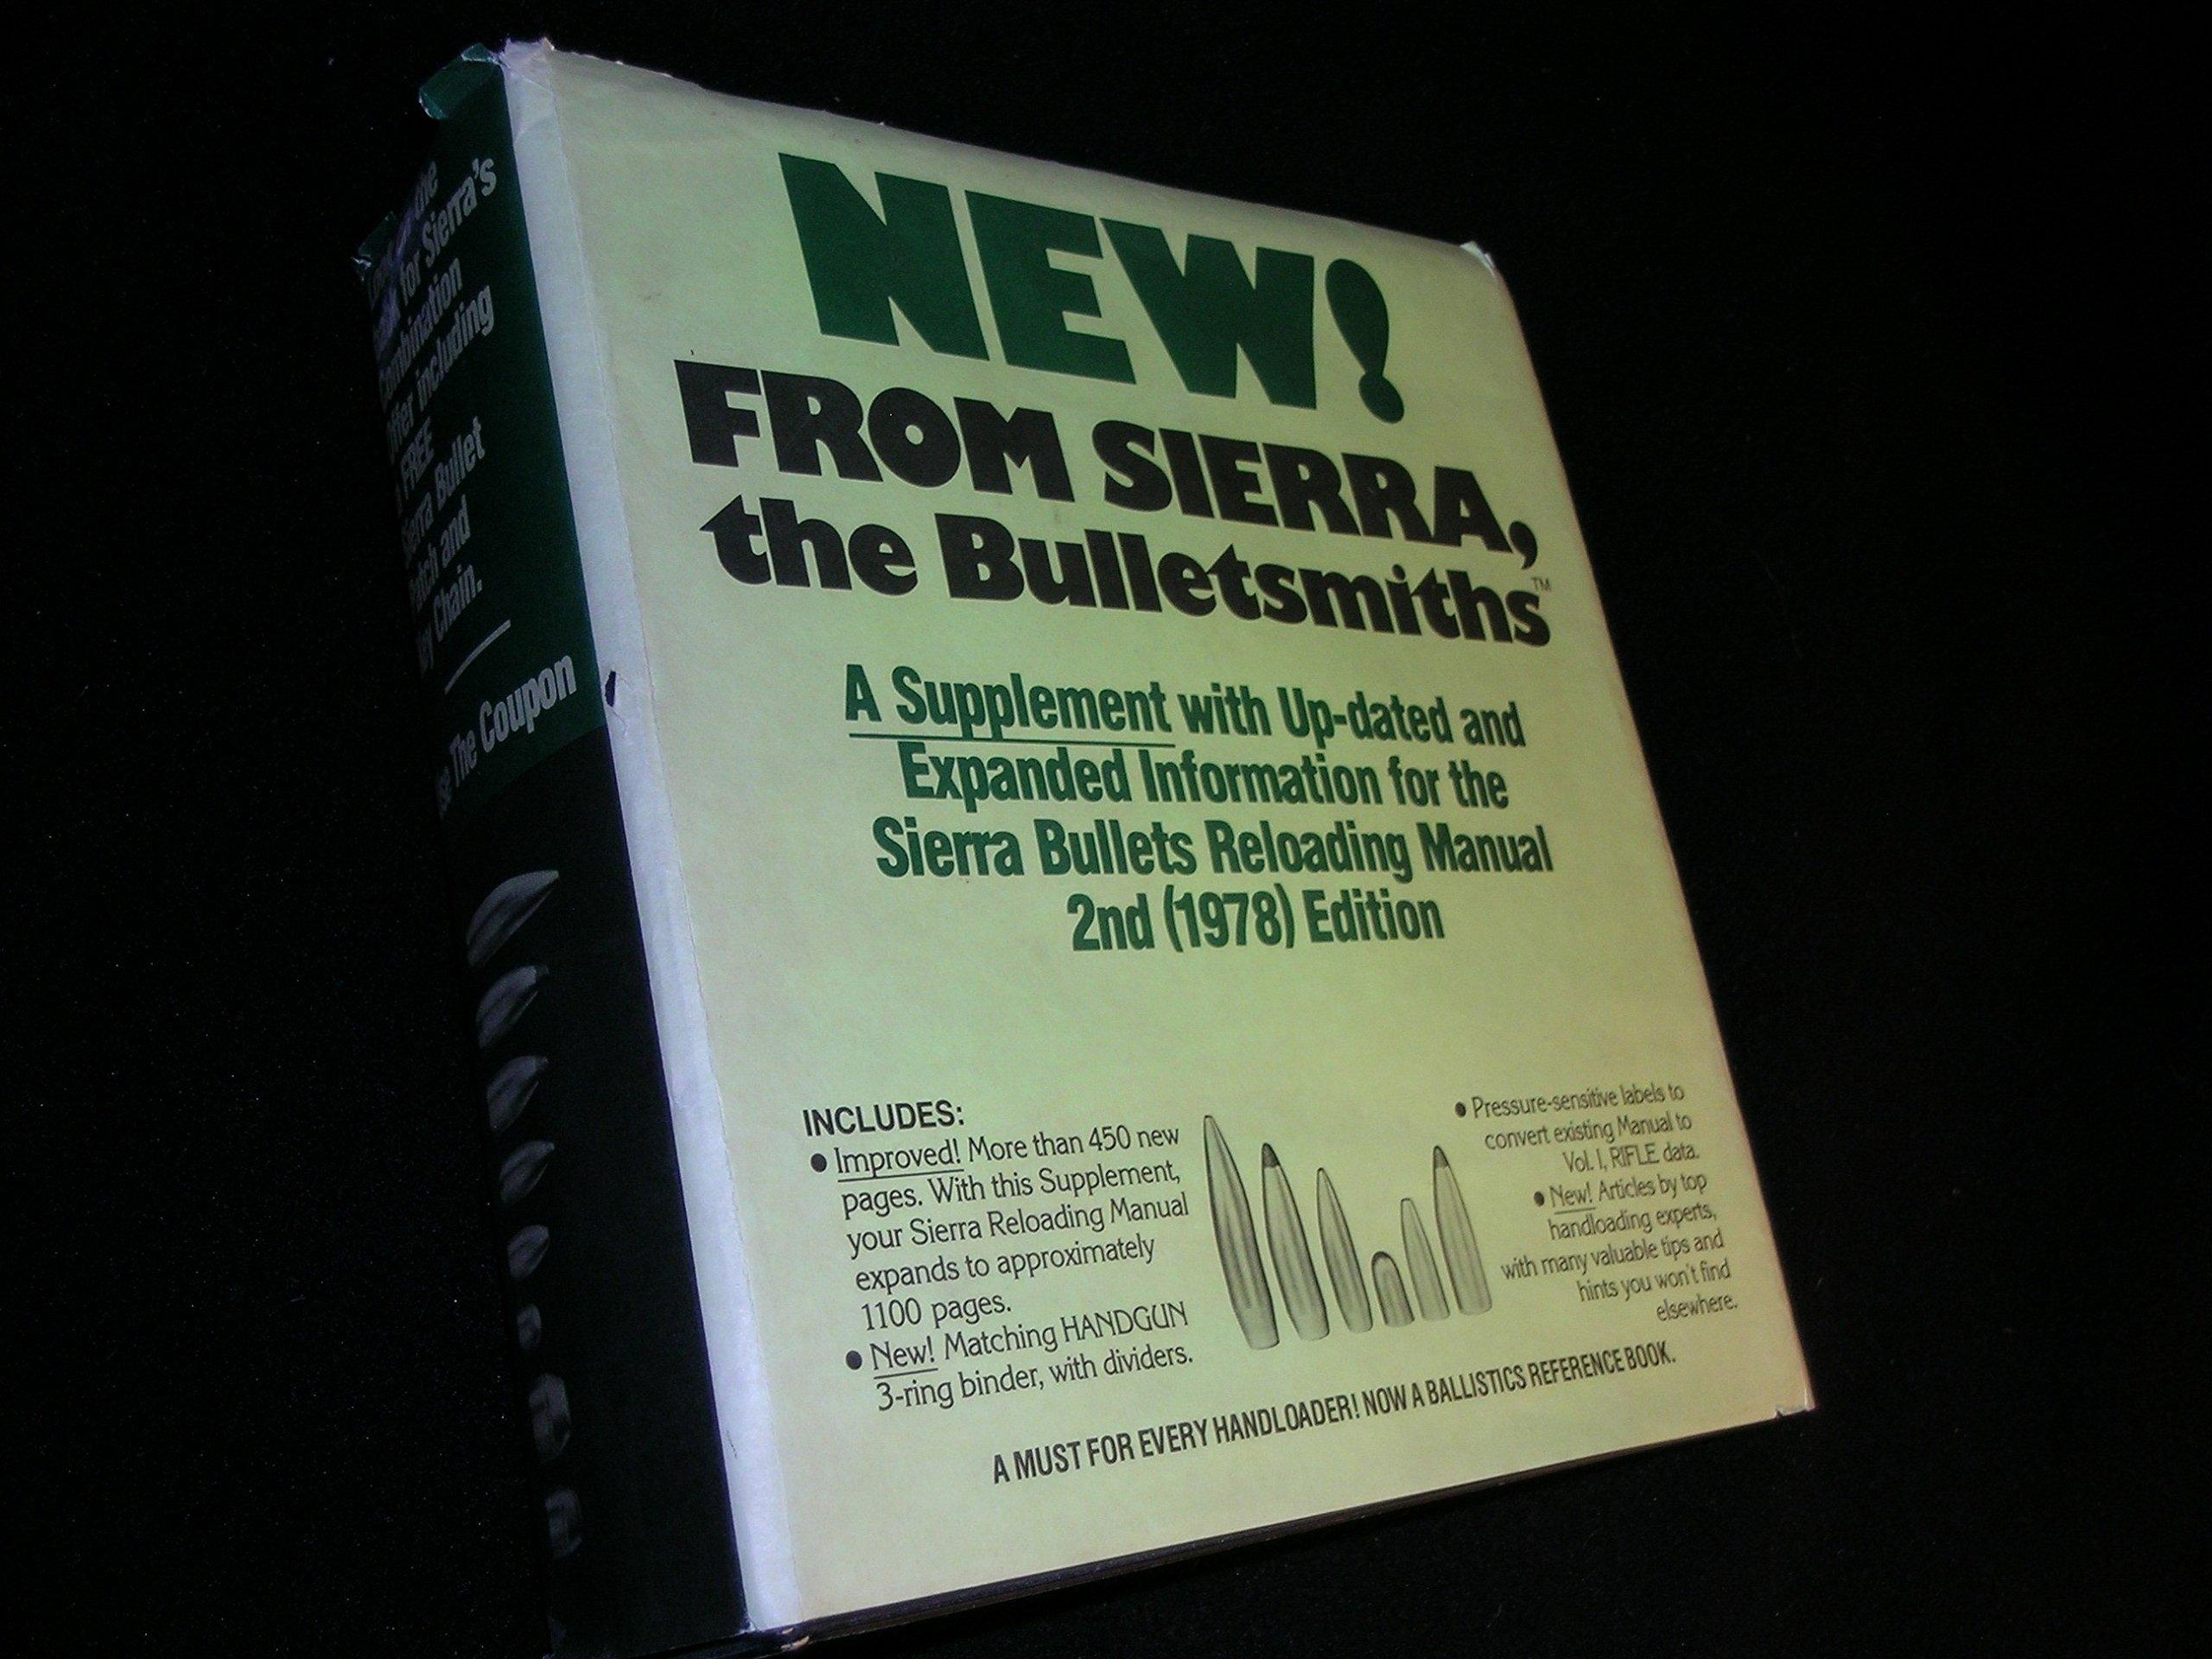 Sierra Bullets Handgun Reloading Manual: Ted C Almgren, Martin J Hull,  William T MacDonald Robert D Hayden, Art Blatt: Amazon.com: Books